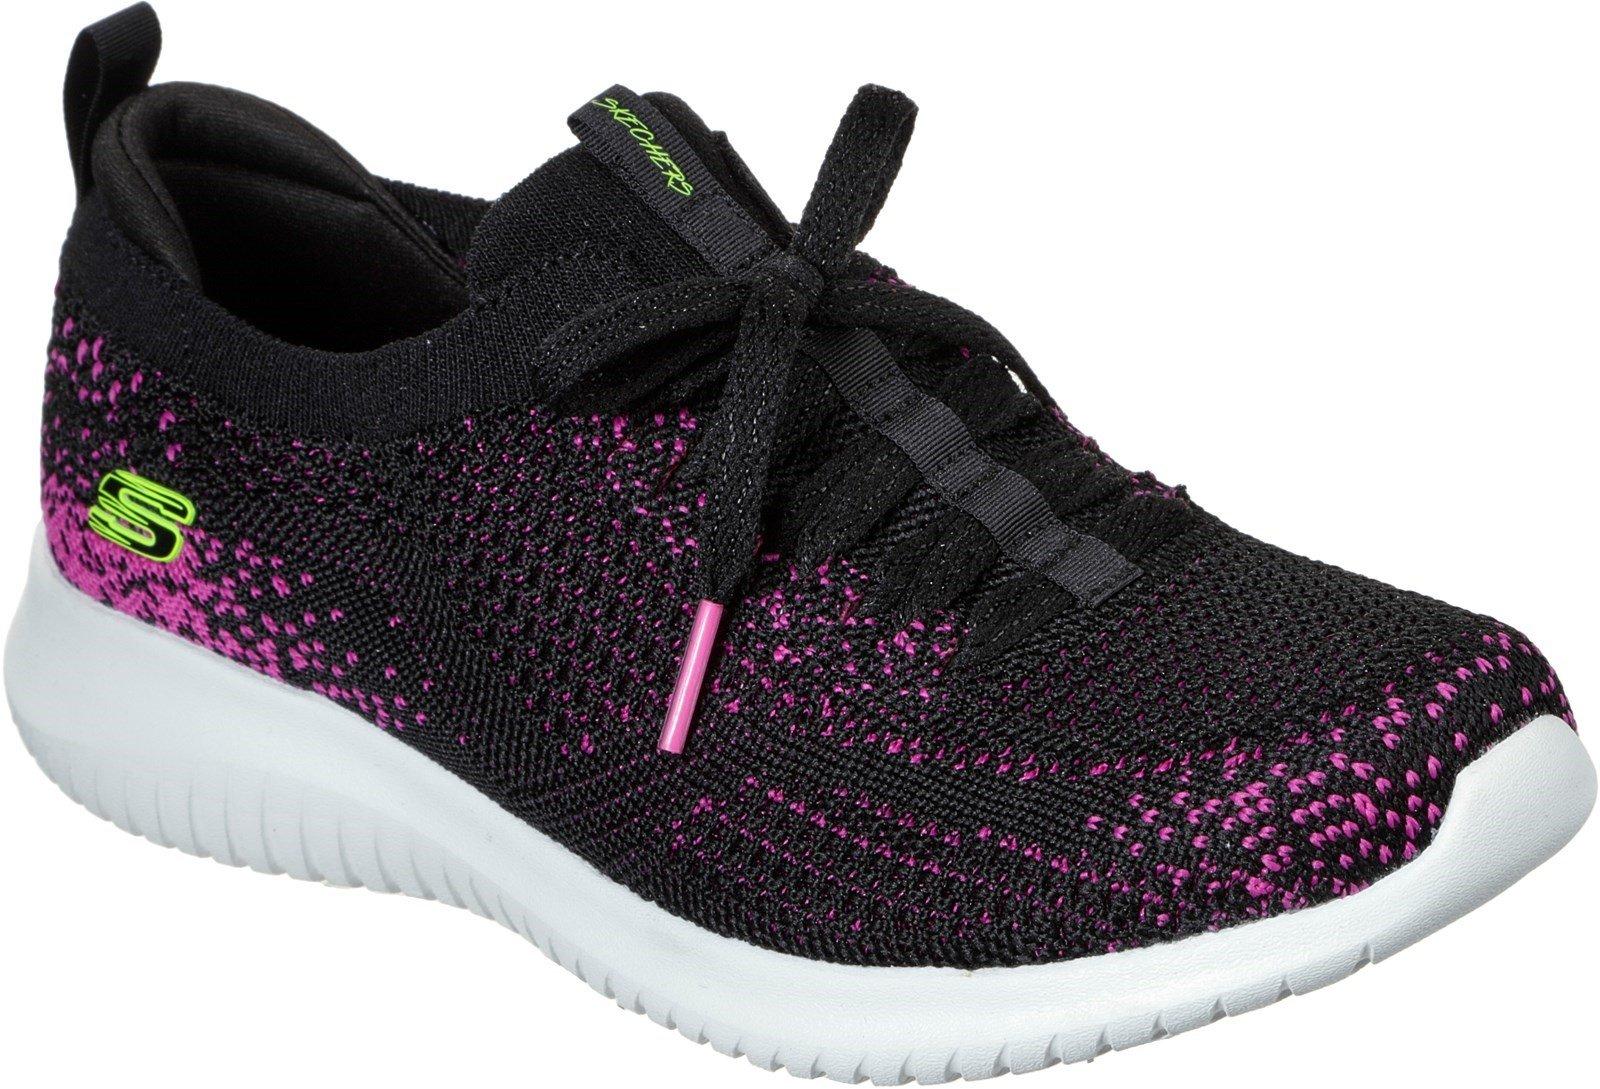 Skechers Women's Ultra Flex Twilight Twinkle Trainer Various Colours 31051 - Black/Hot pink 3